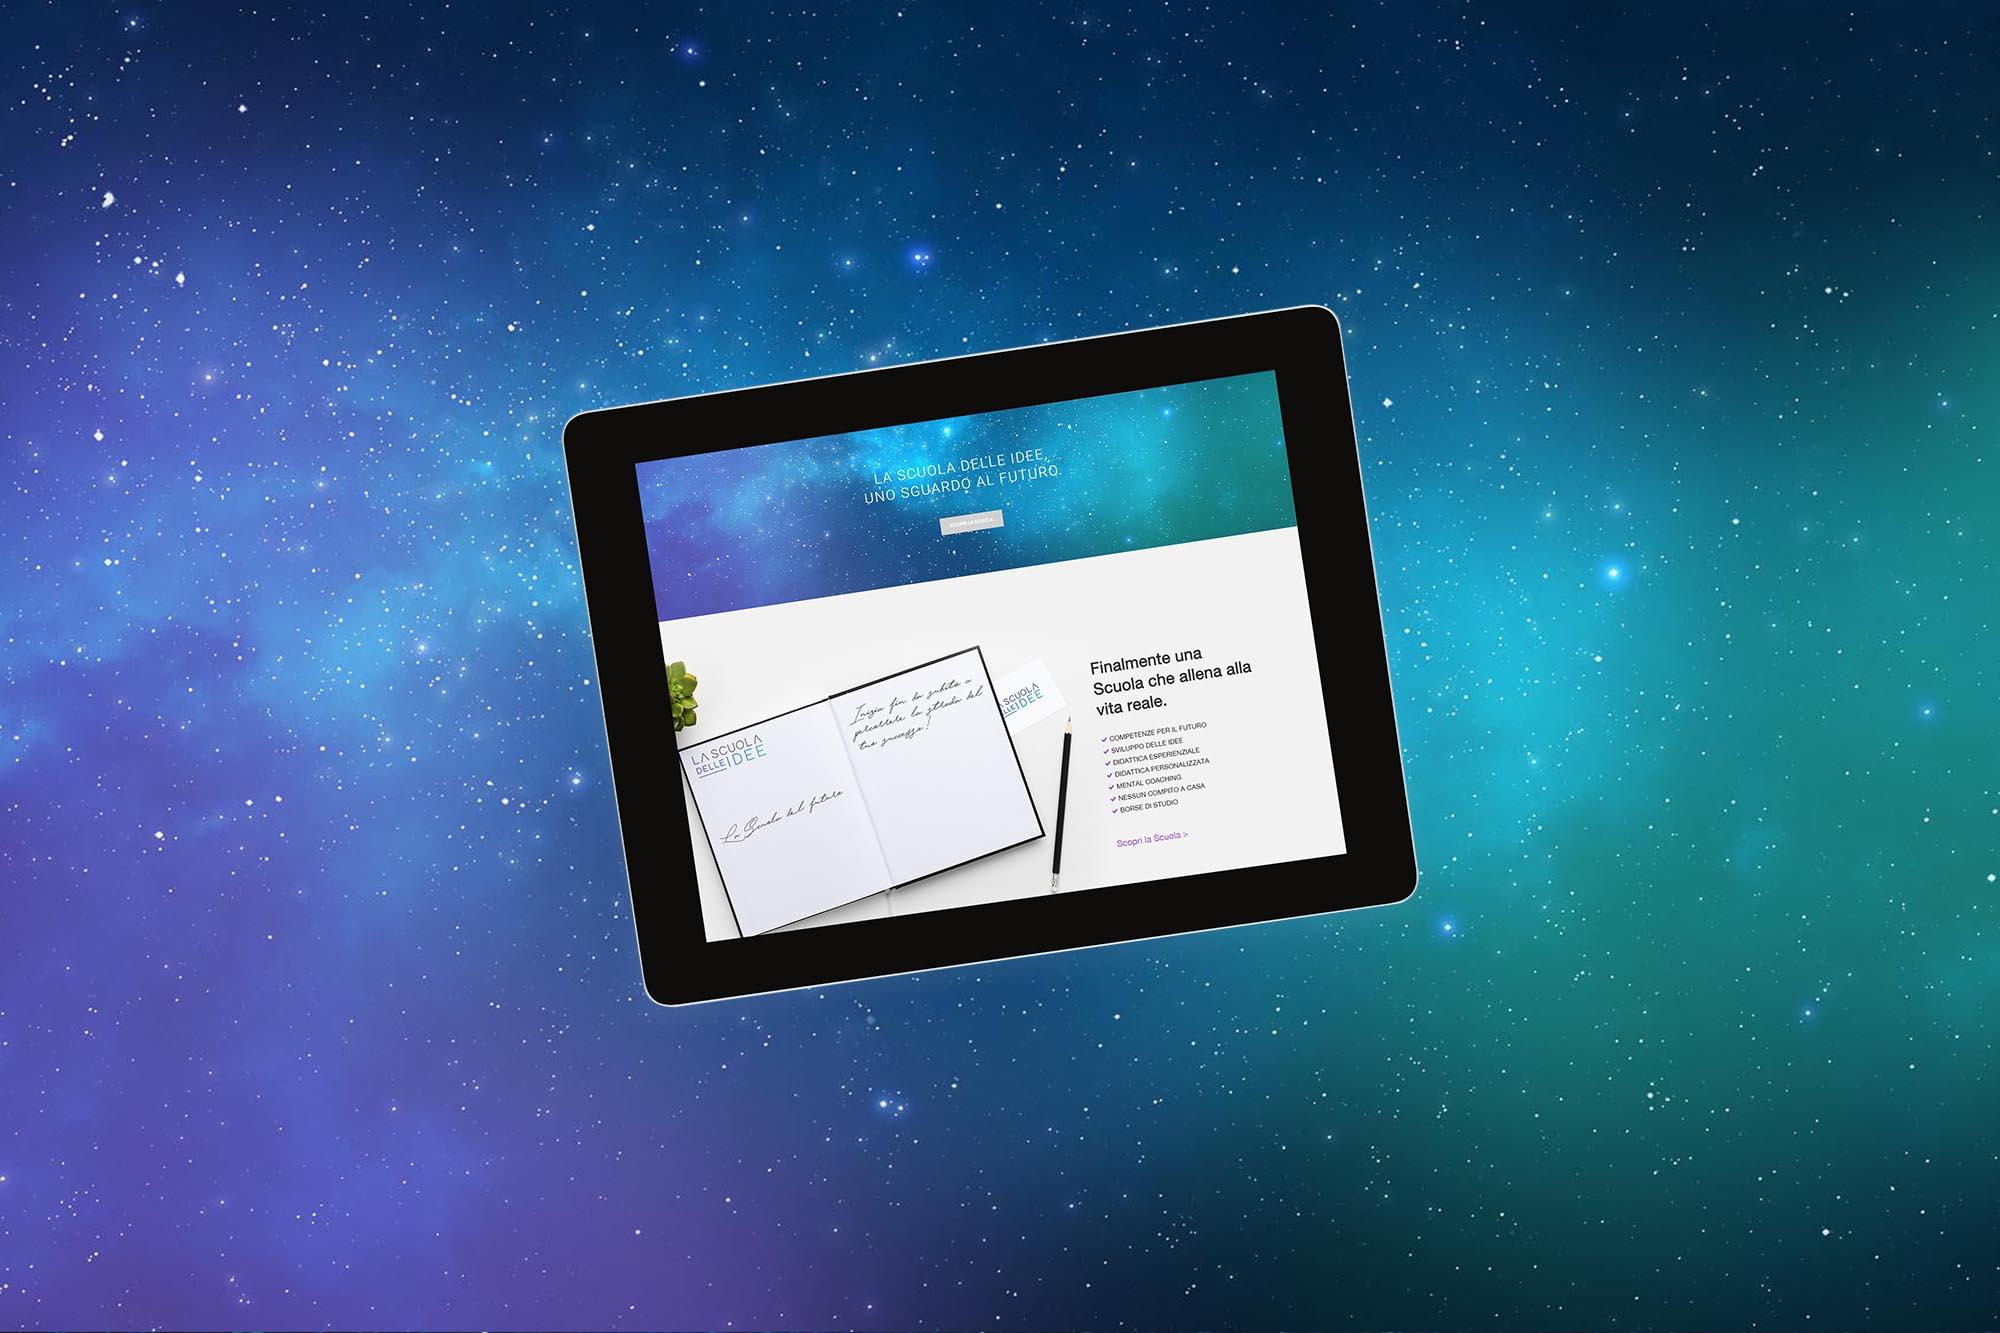 tablet-scuola-delle-idee-4